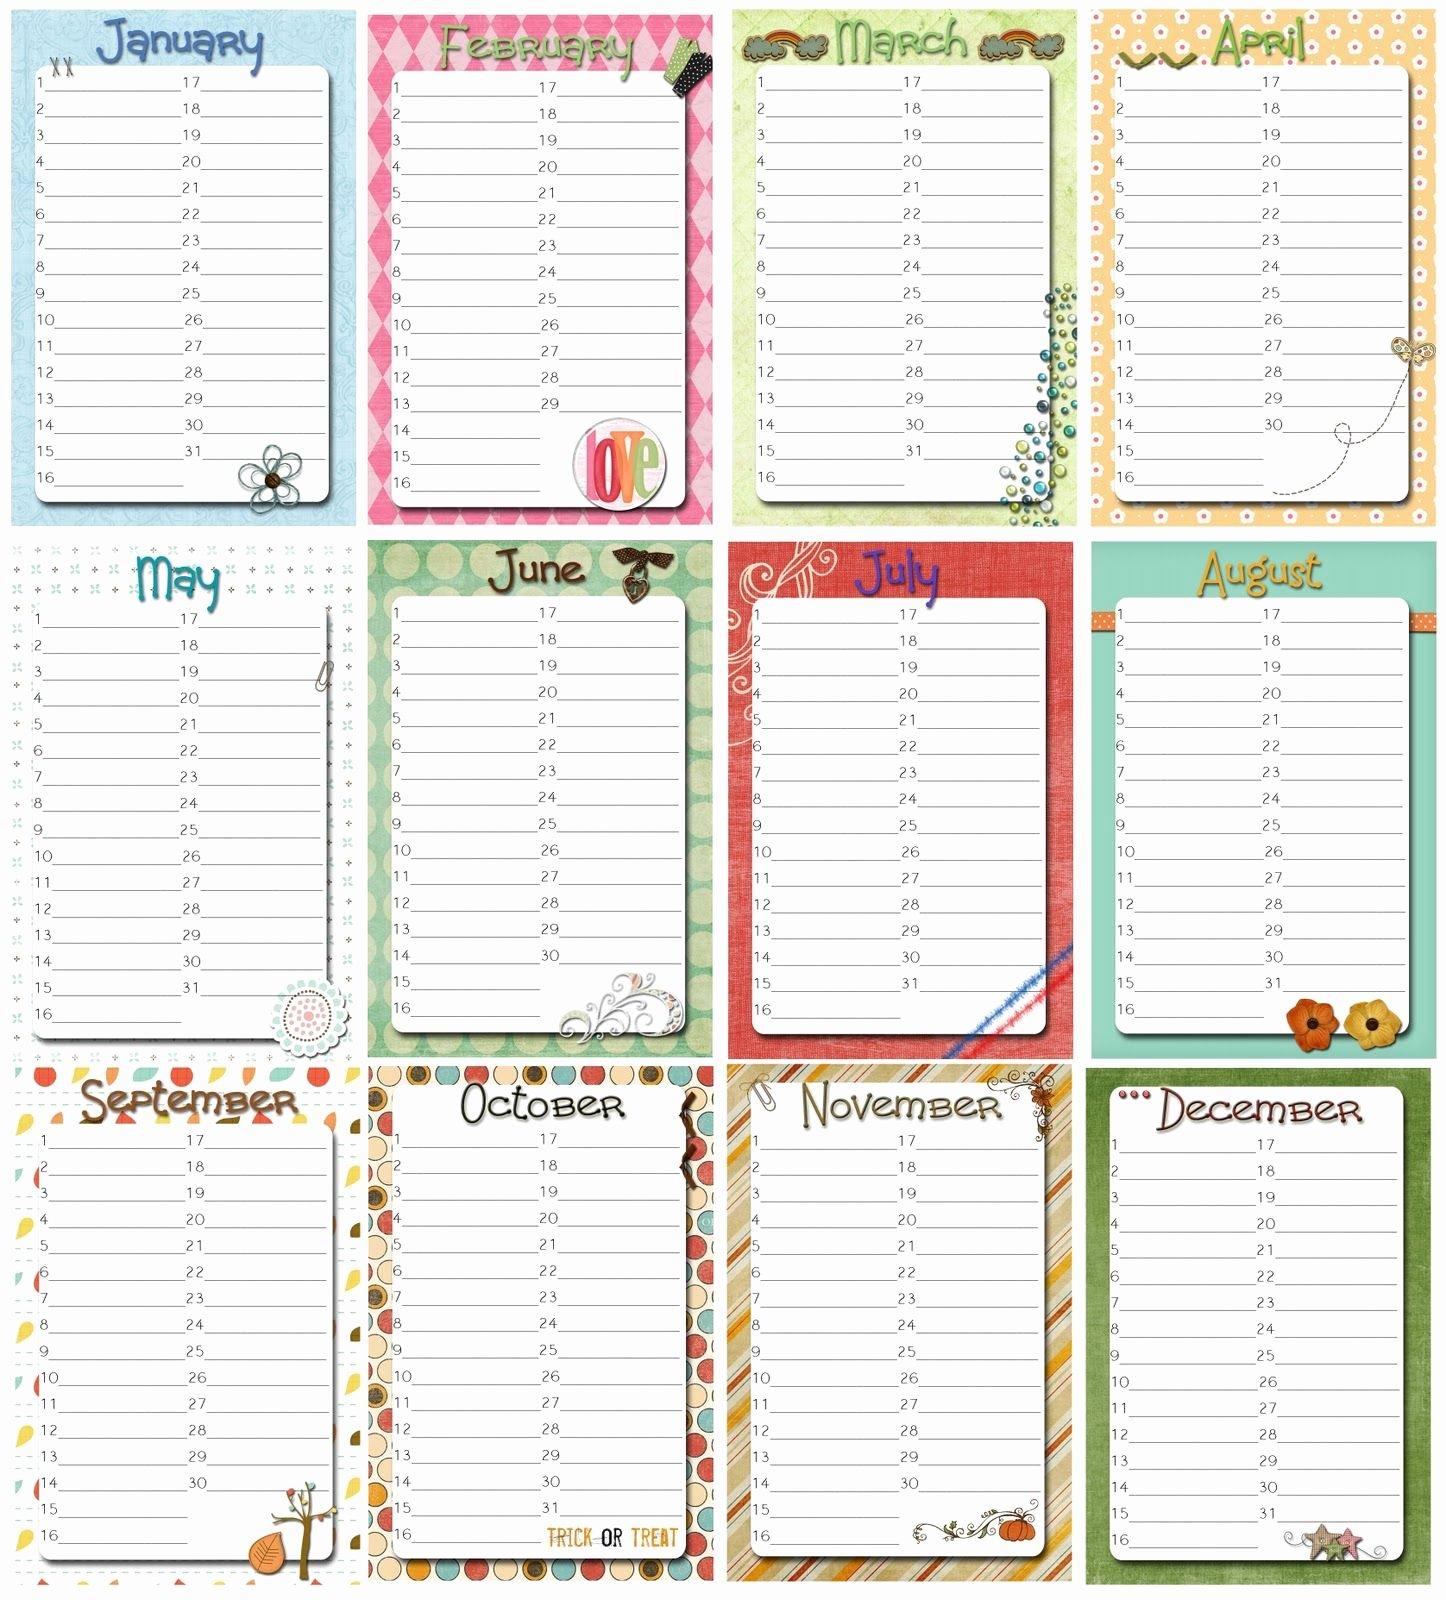 Printable Birthday Calendar Template Lovely Family Birthday Calendar Printable Free